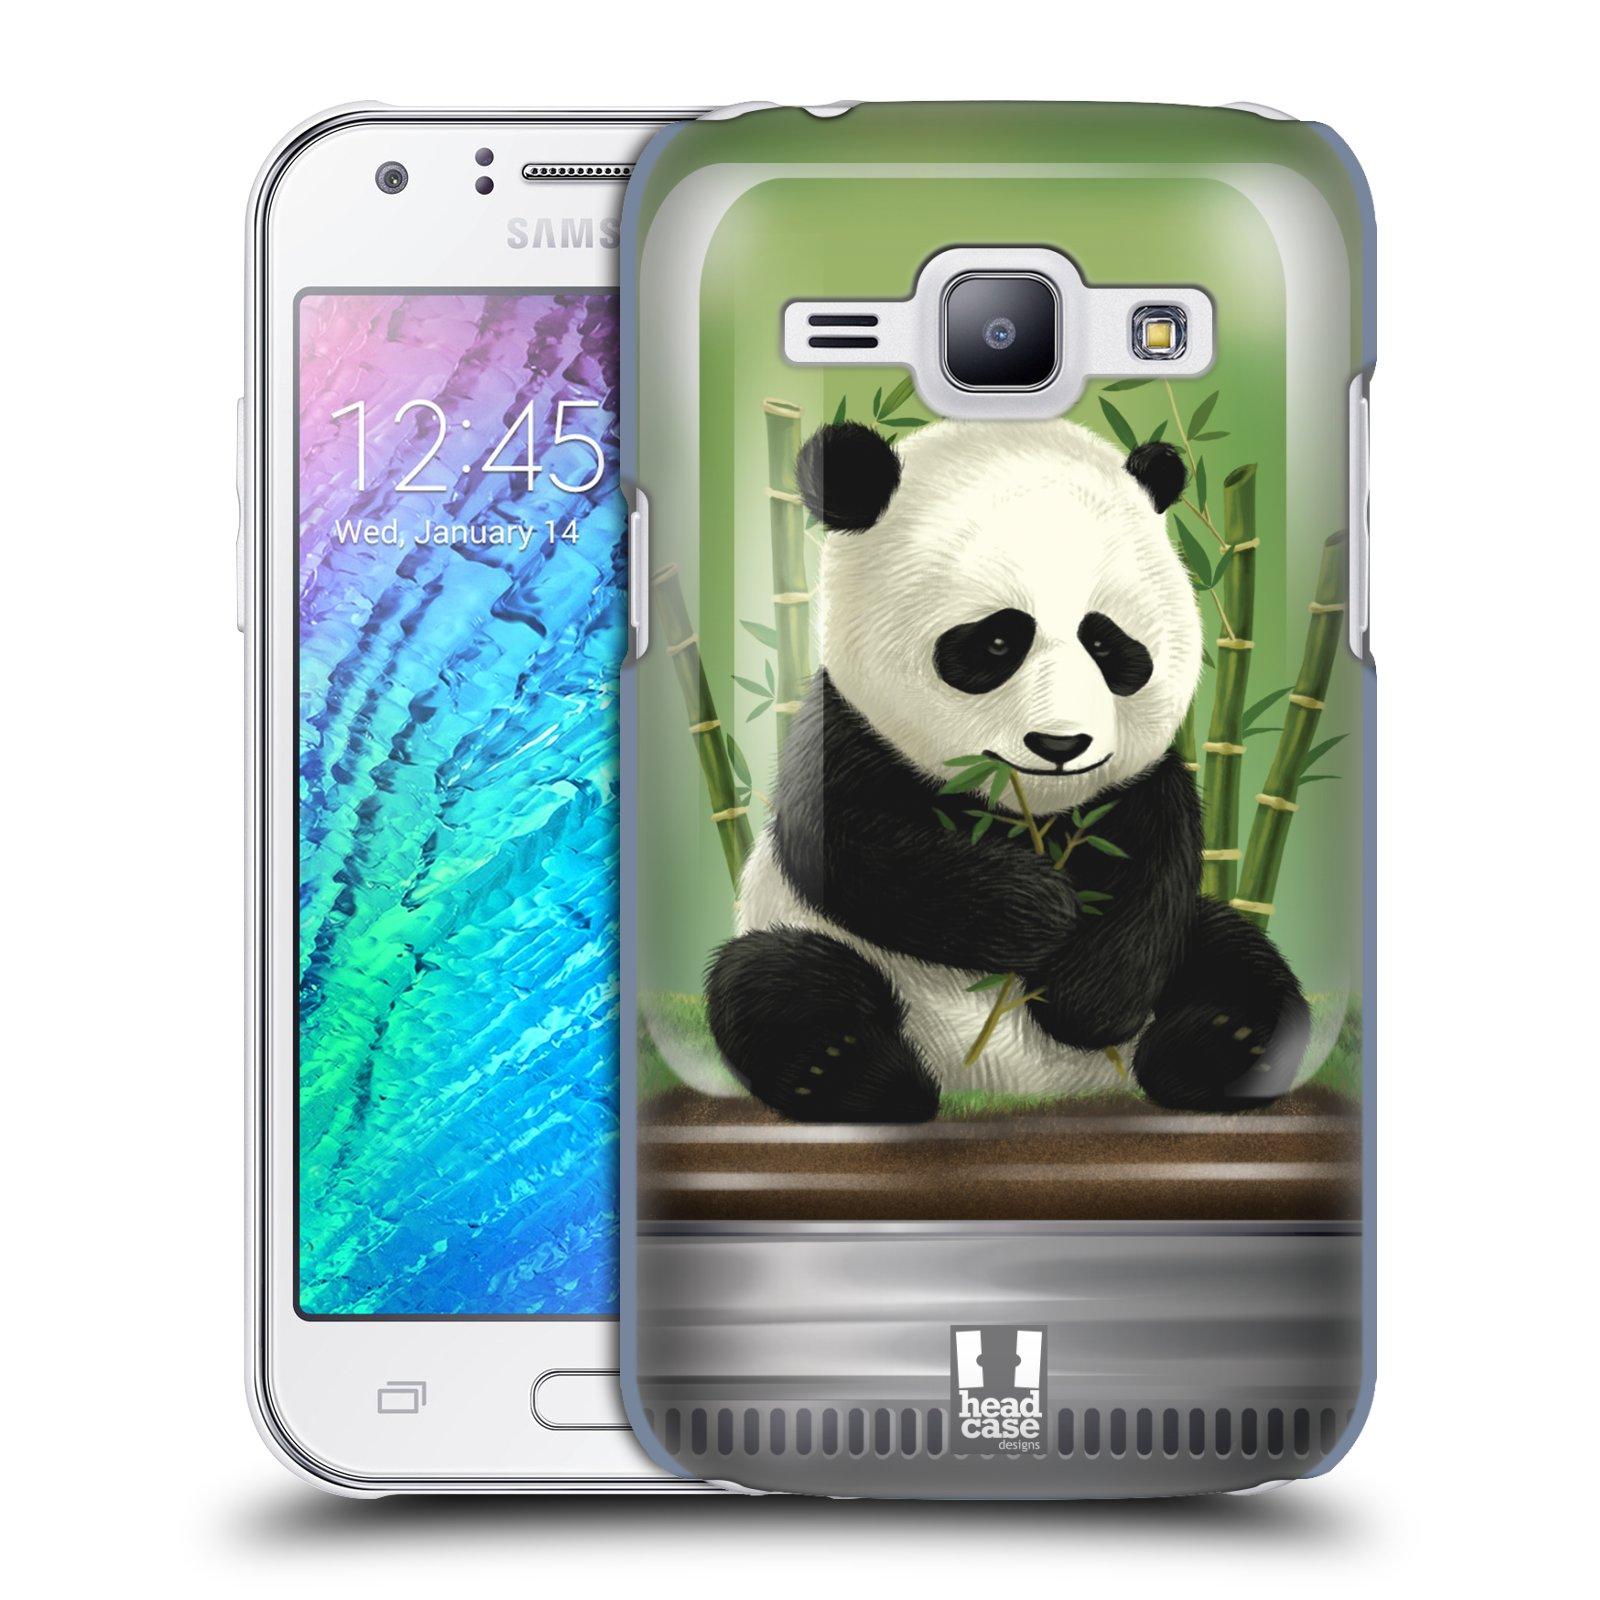 HEAD CASE plastový obal na mobil SAMSUNG Galaxy J1, J100 vzor Zvířátka v těžítku panda